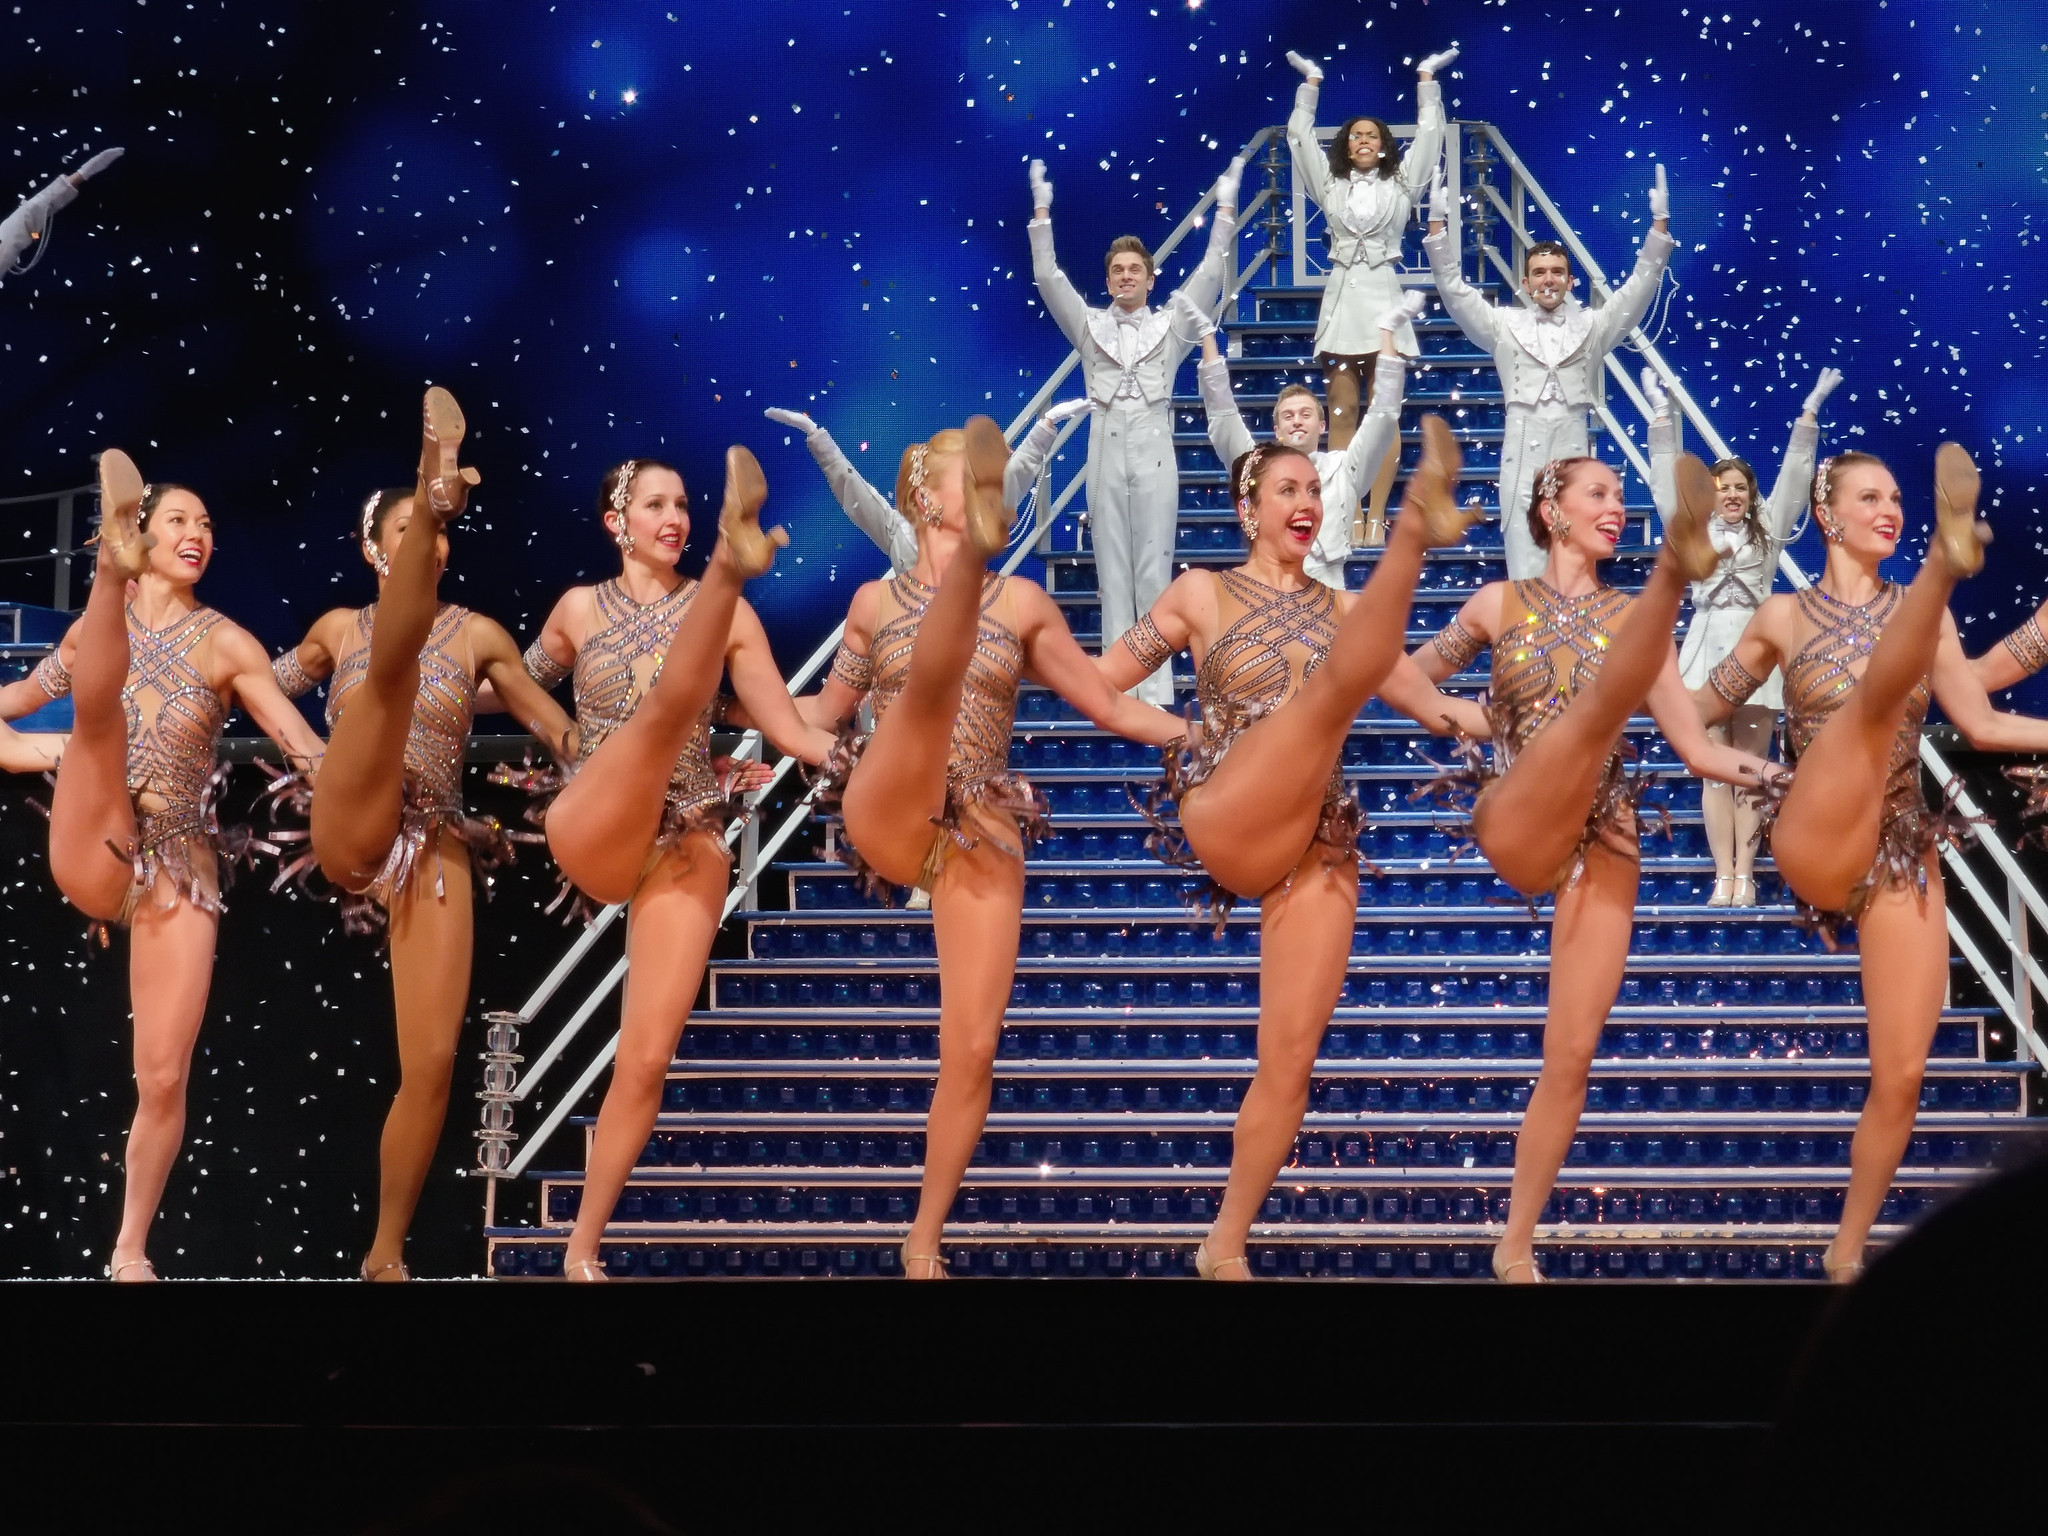 Nude group dancing malaysia